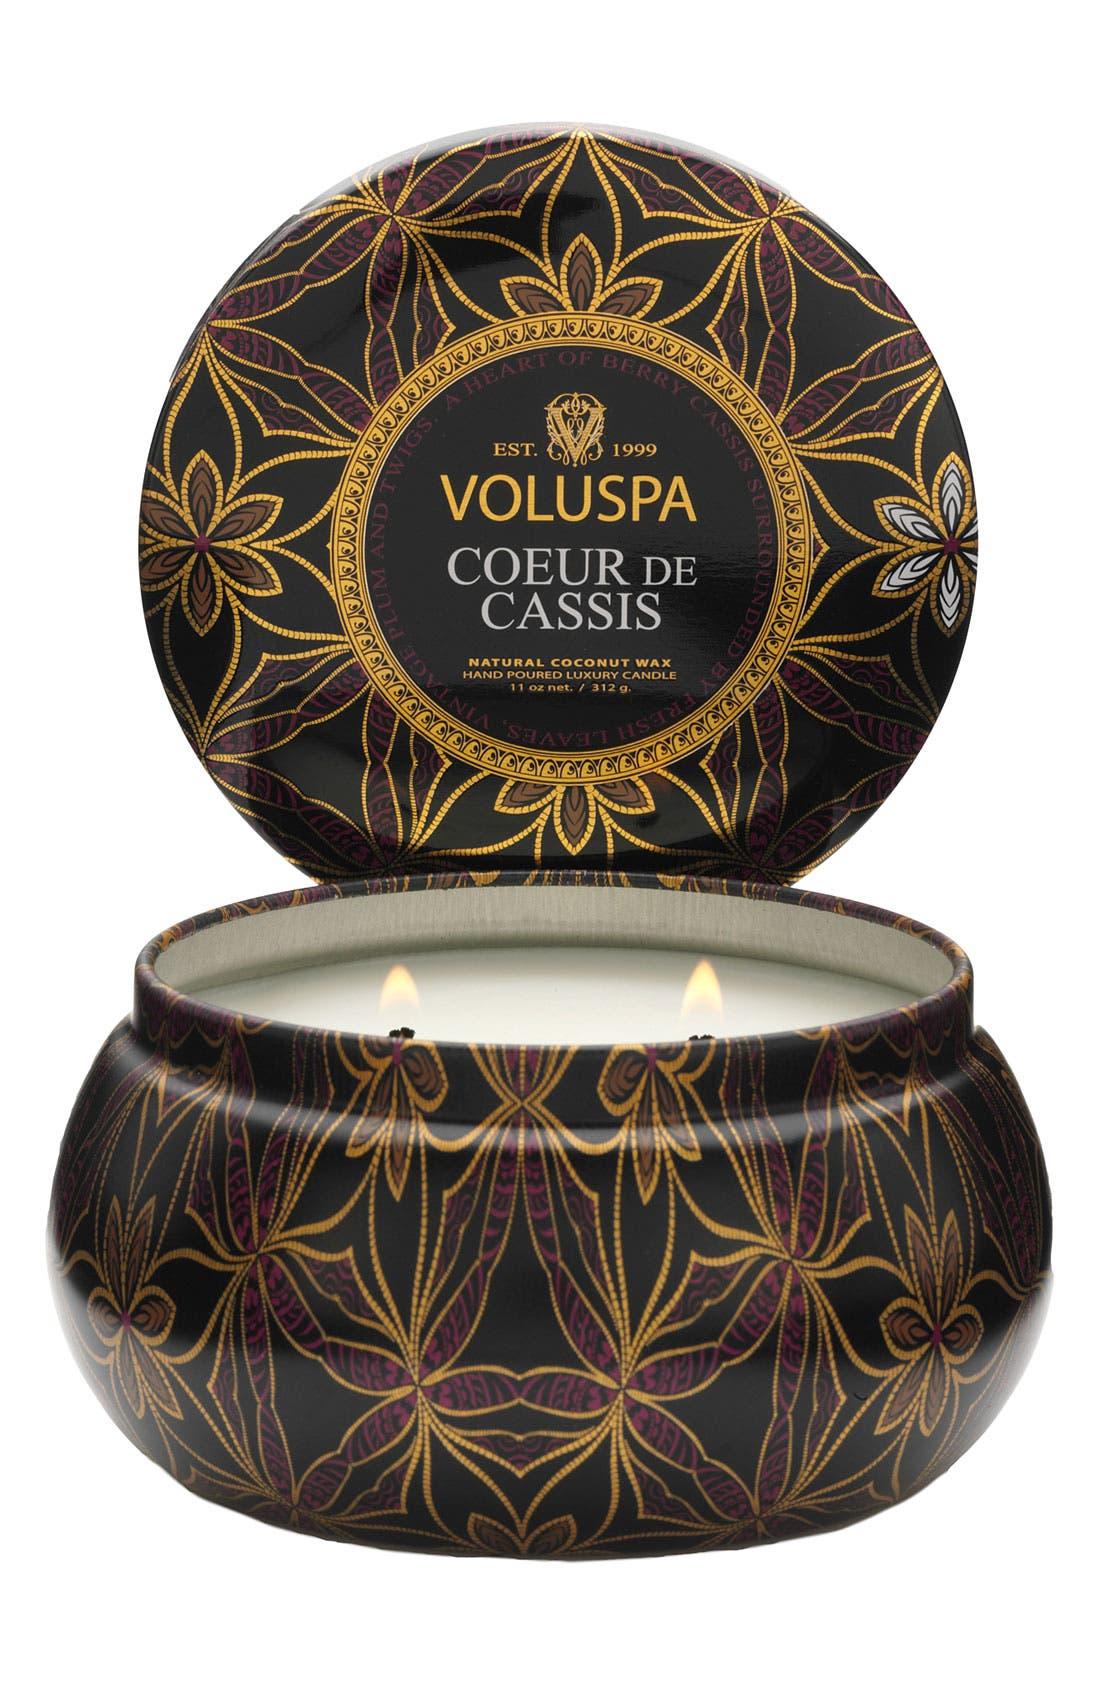 Alternate Image 1 Selected - Voluspa 'Maison d'Or - Coeur de Cassis' 2-Wick Candle